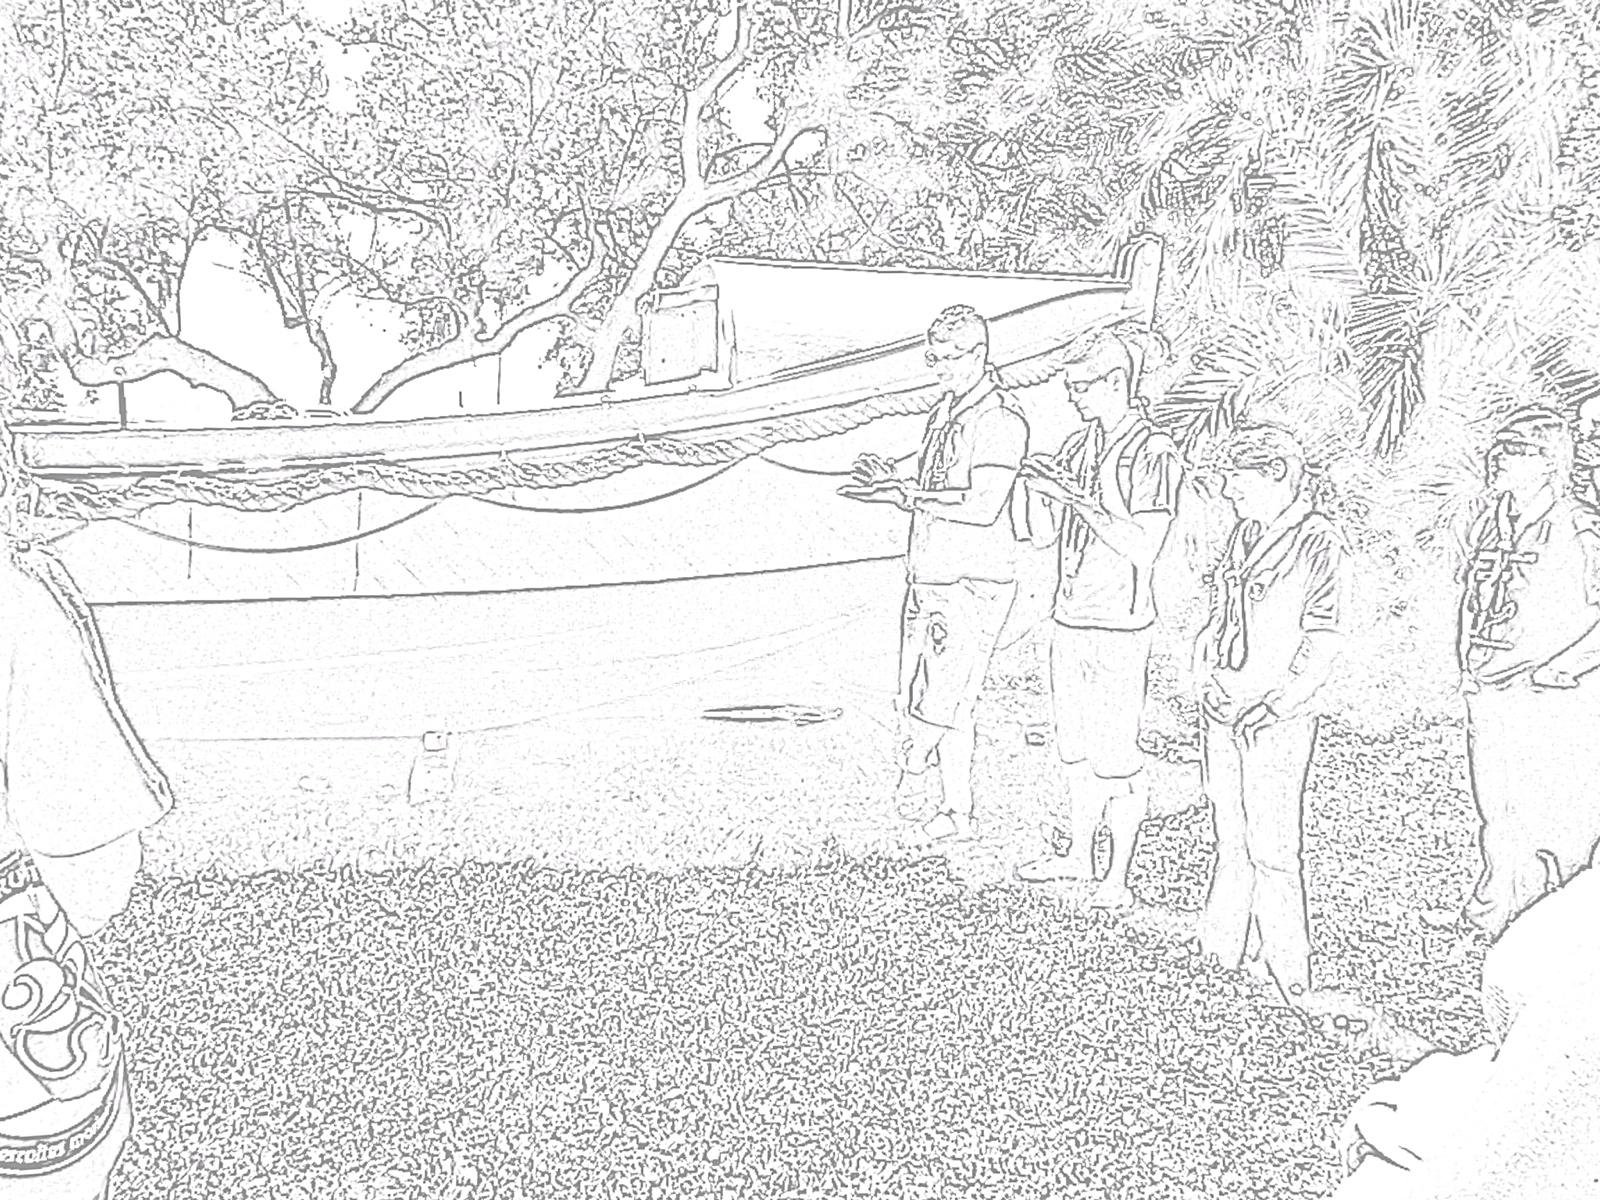 Monogràfic Marí 2010 - P5290206.JPG